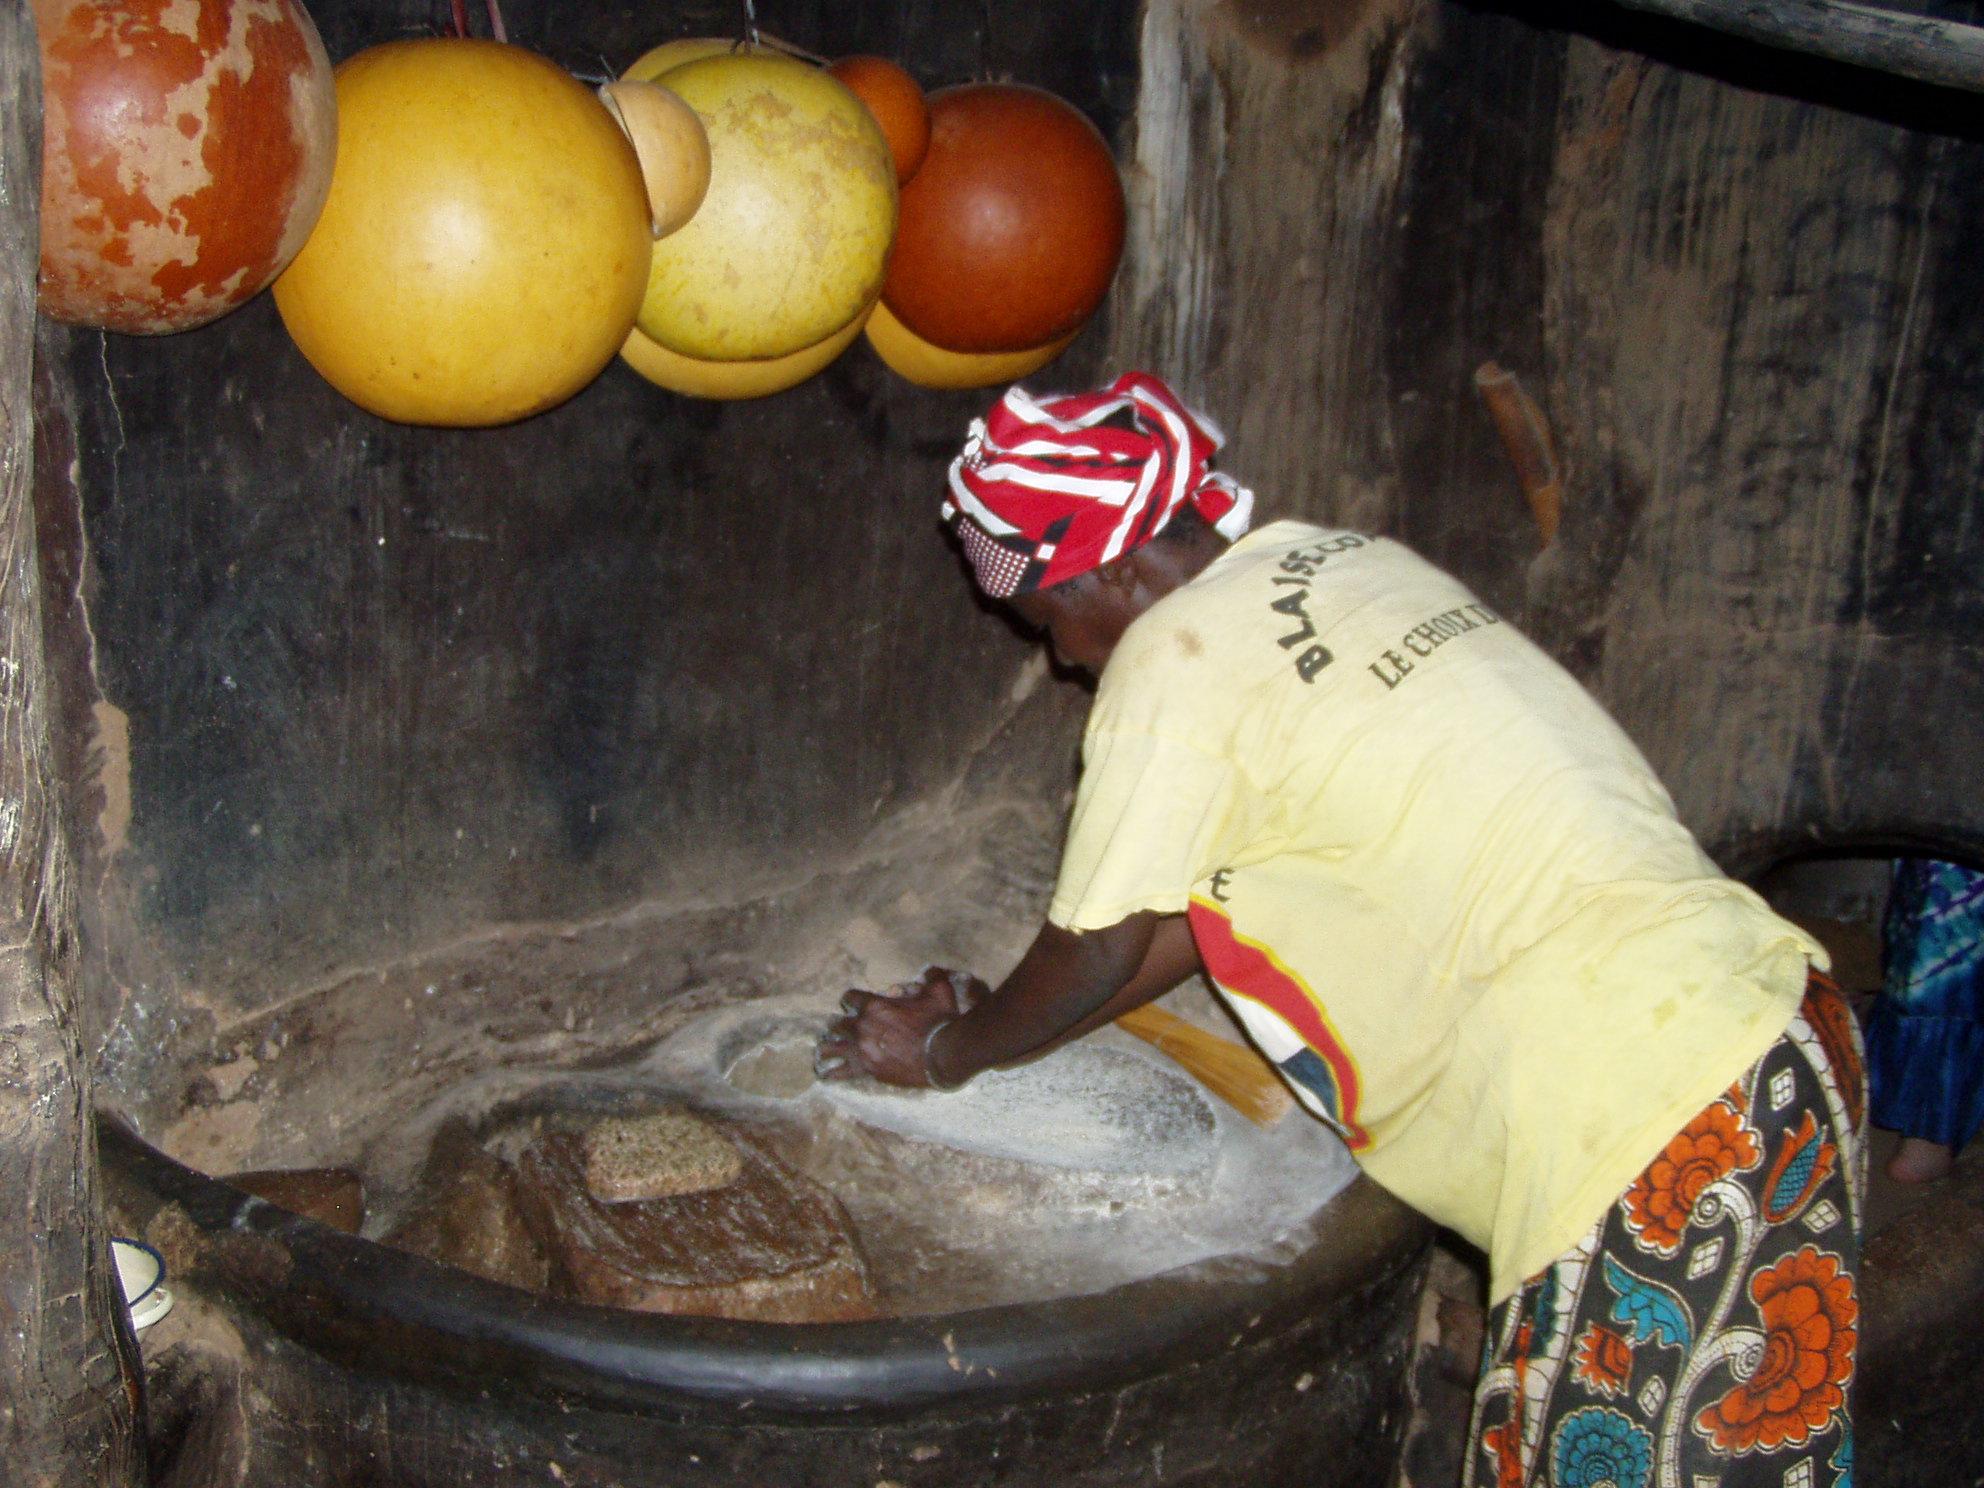 Femme en train de moudre du mil. Lady grinding millet.